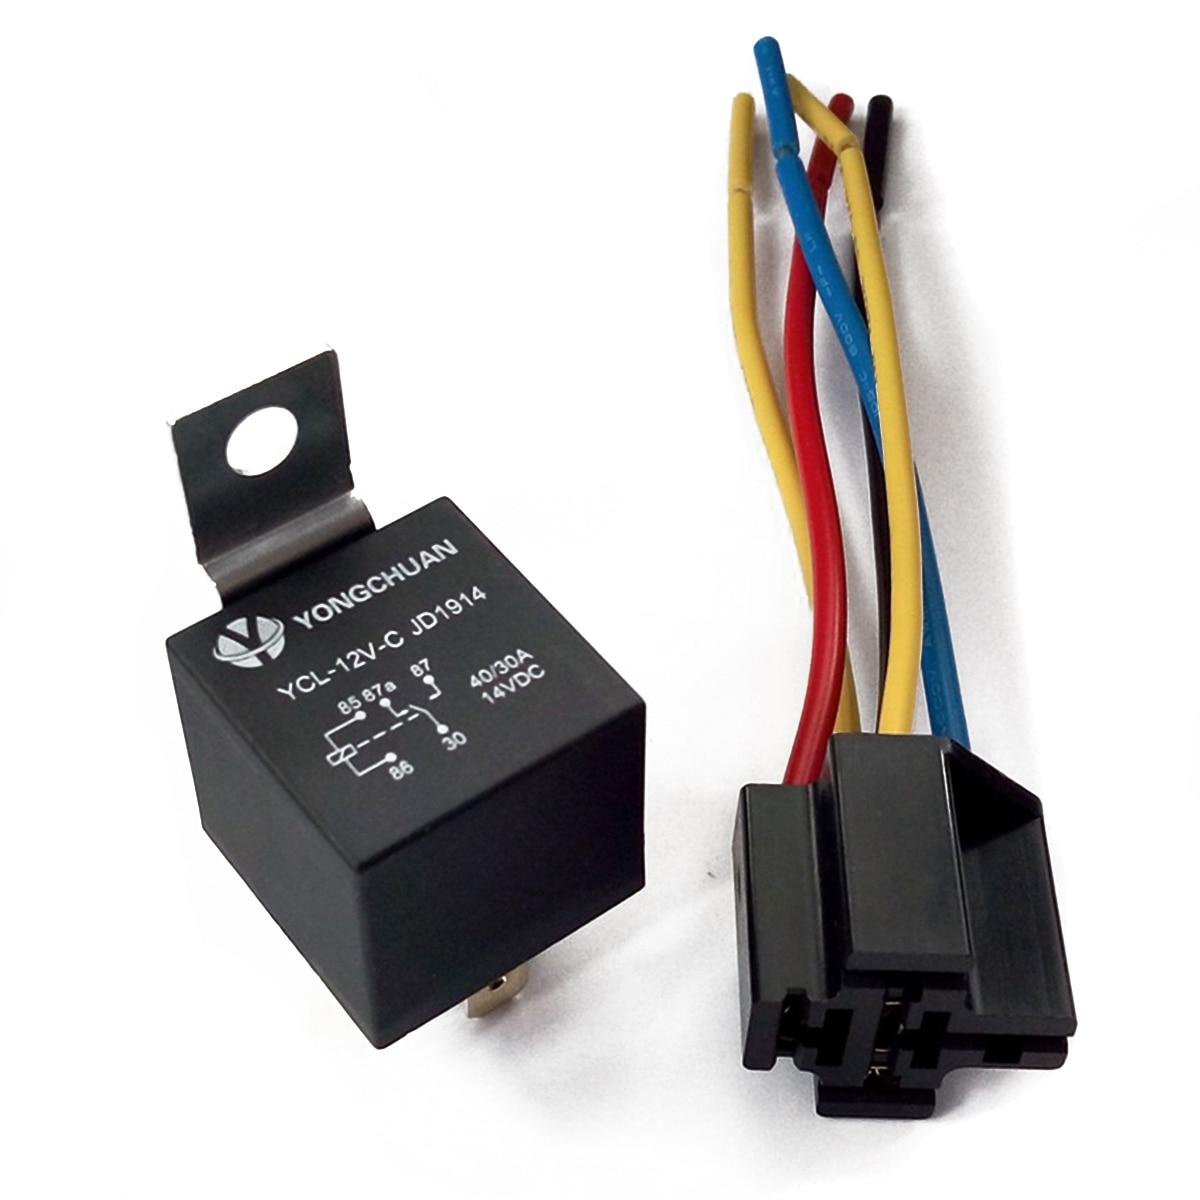 US $10.19 41% OFF|5 Set 5 Pin 5 Wire Waterproof Car Relay & Socket on